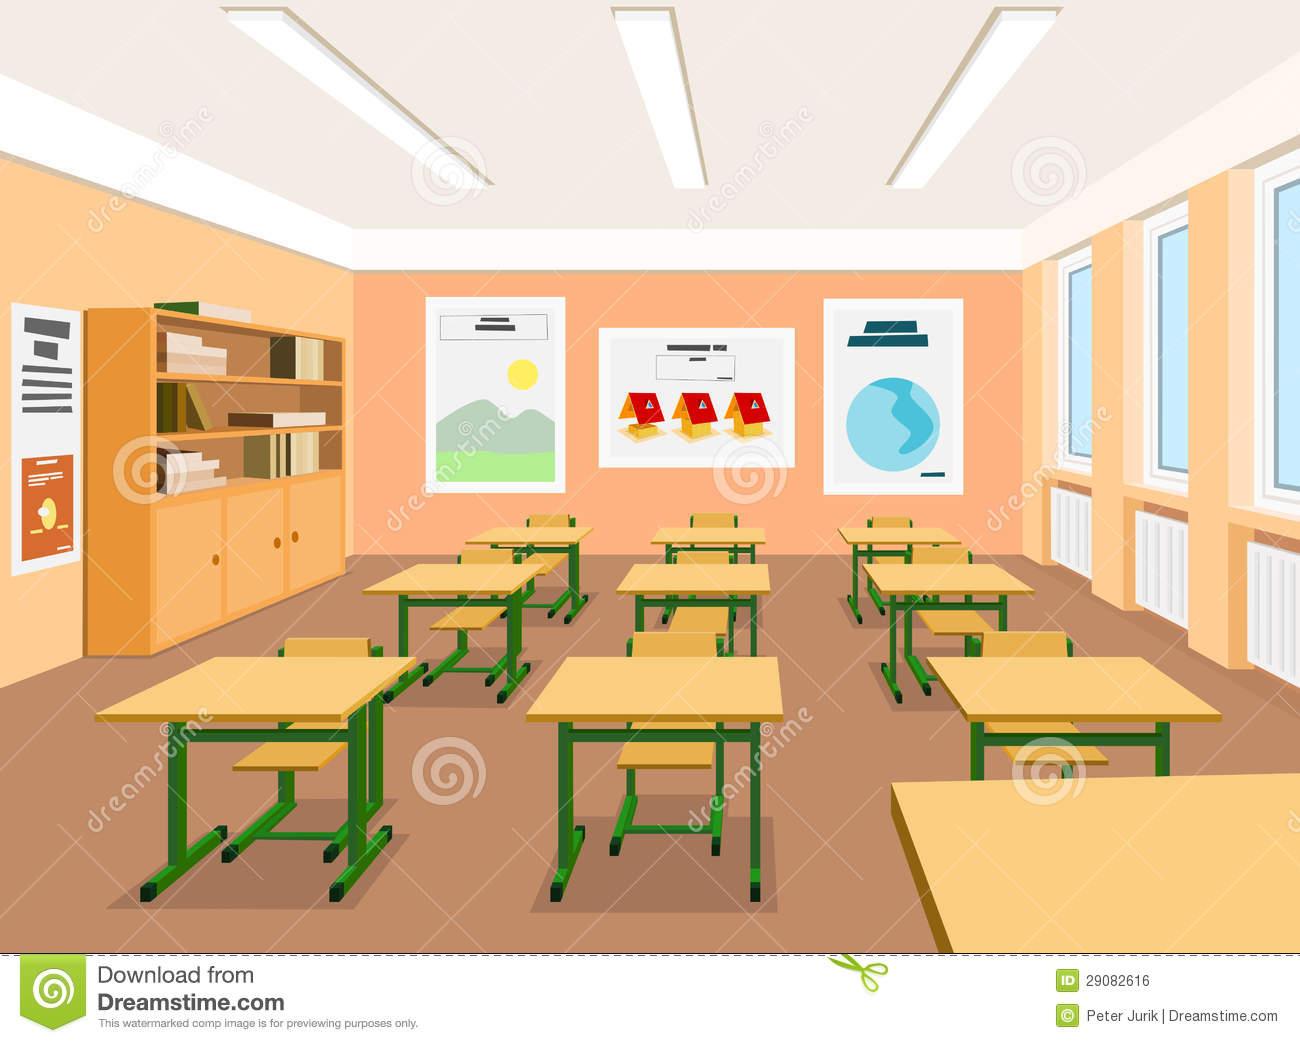 Classrooms clipart.